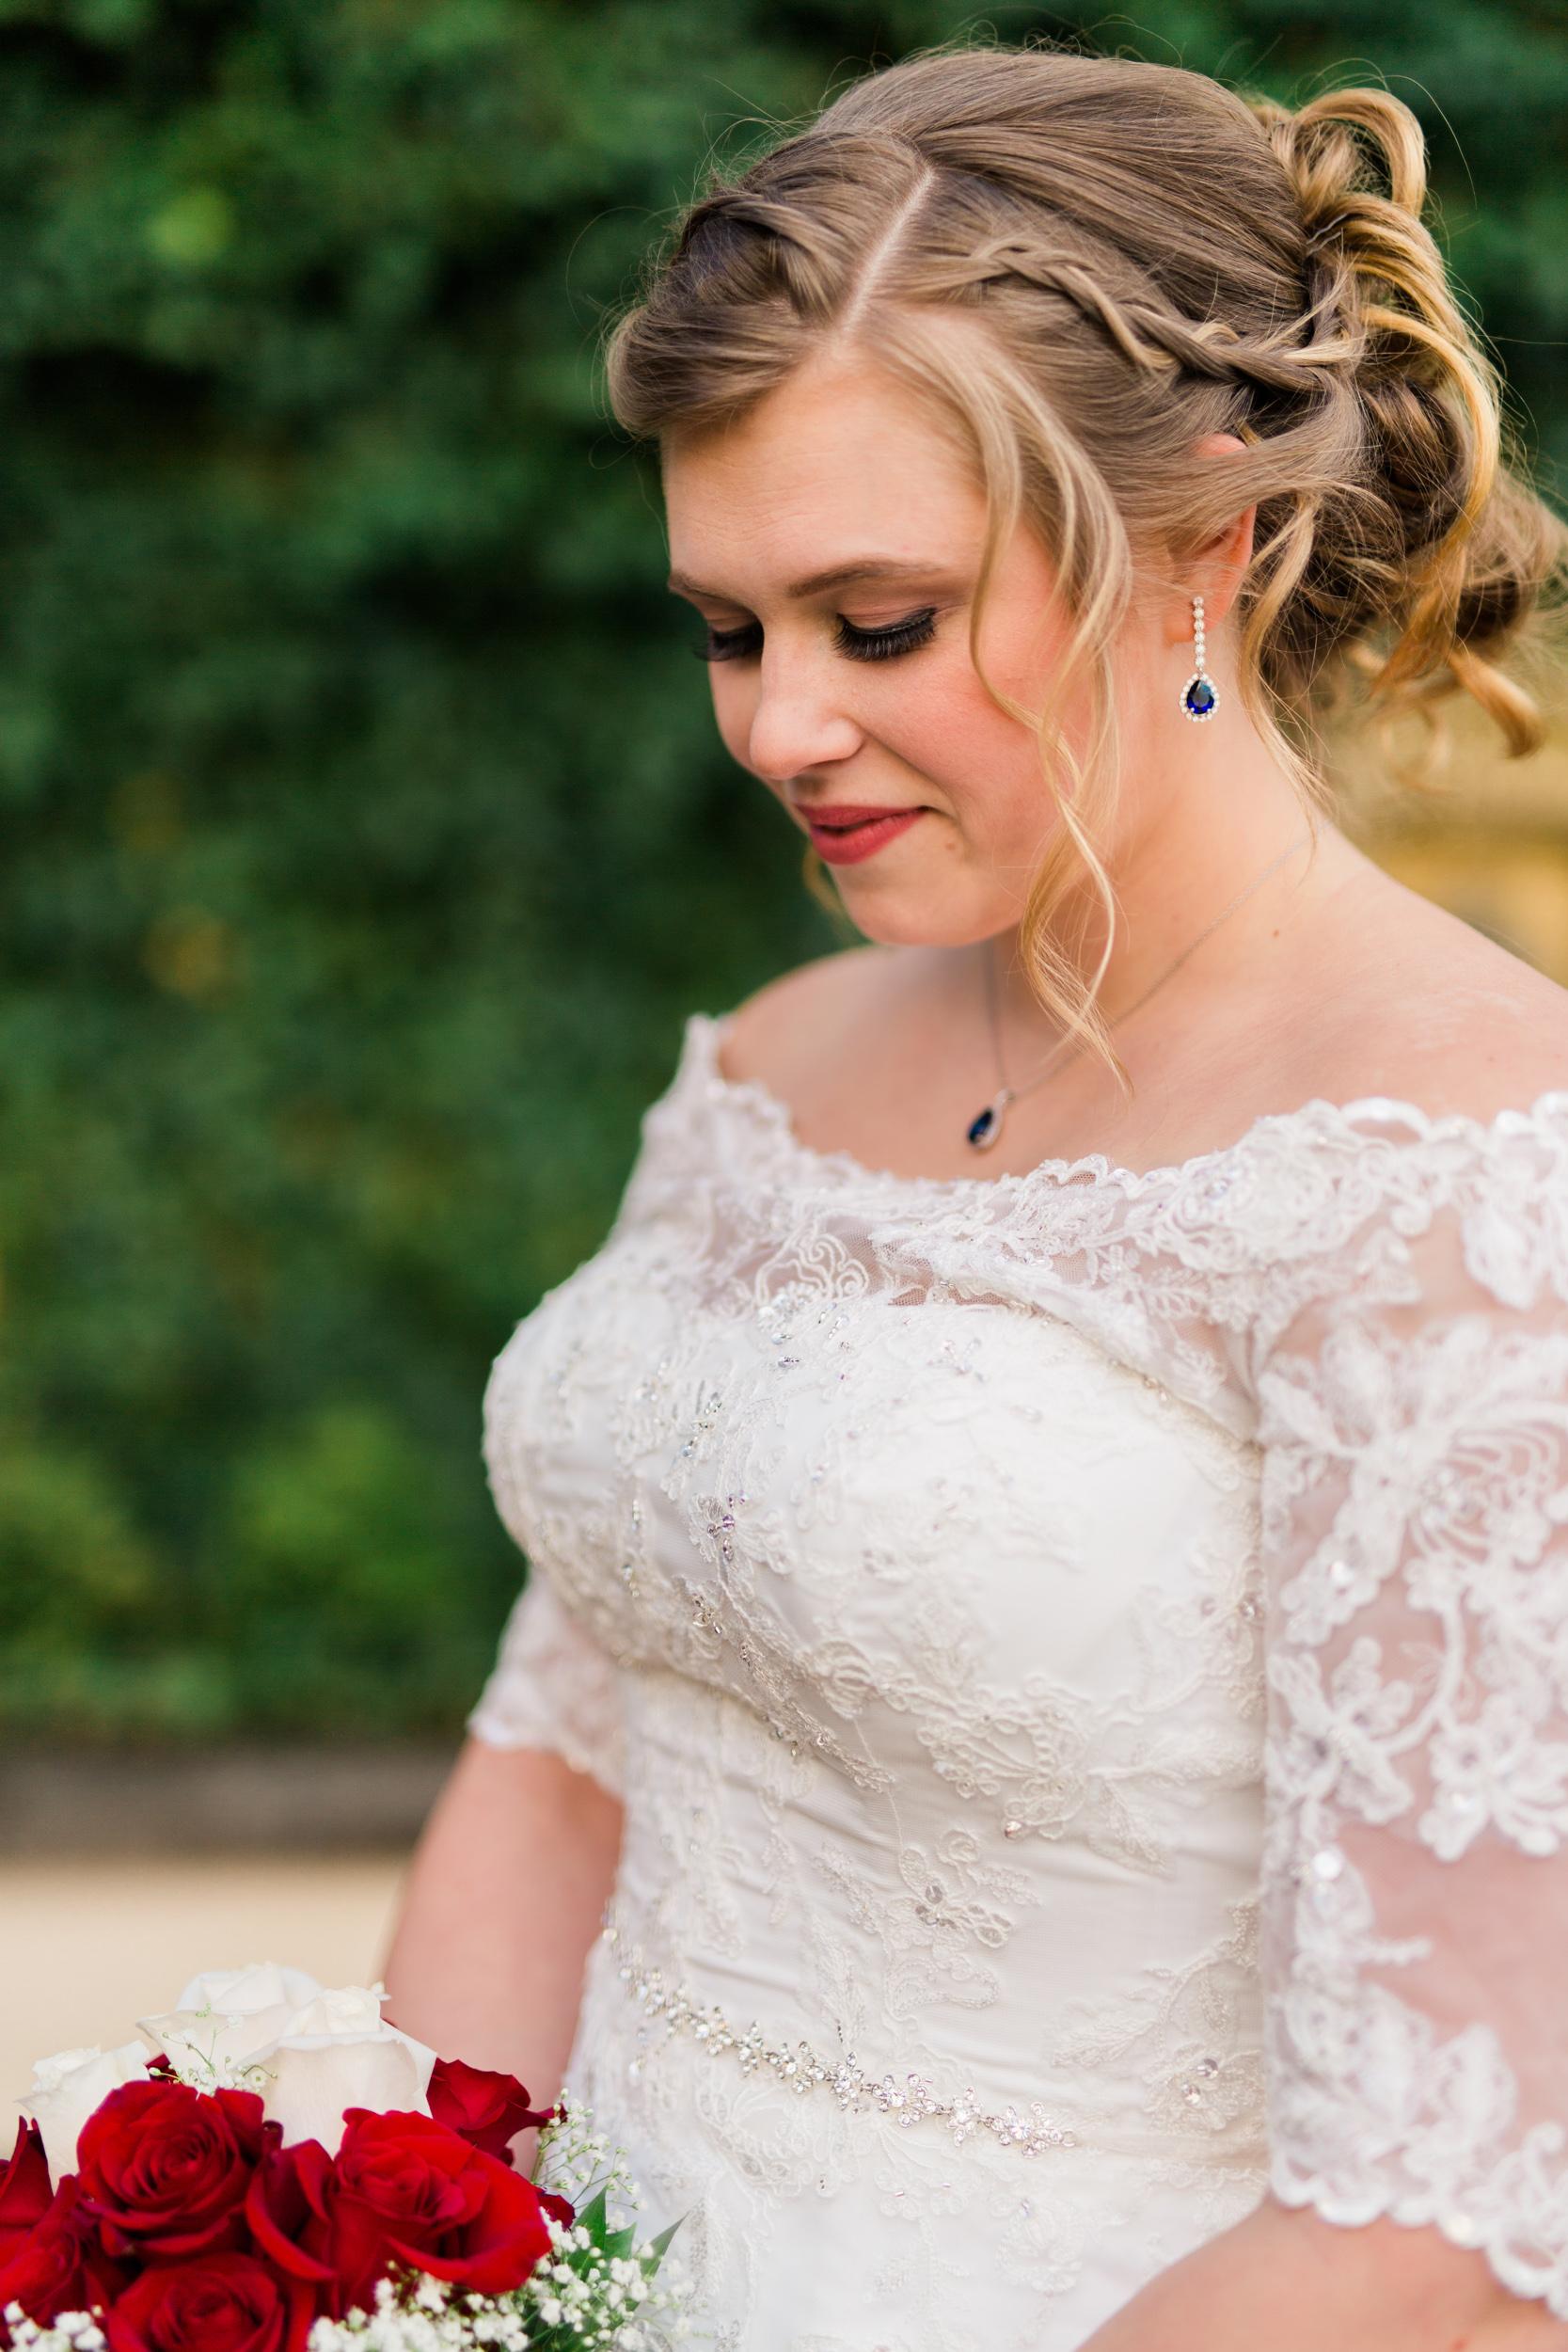 61-4478-jewel-maree-photography-wedding.jpg